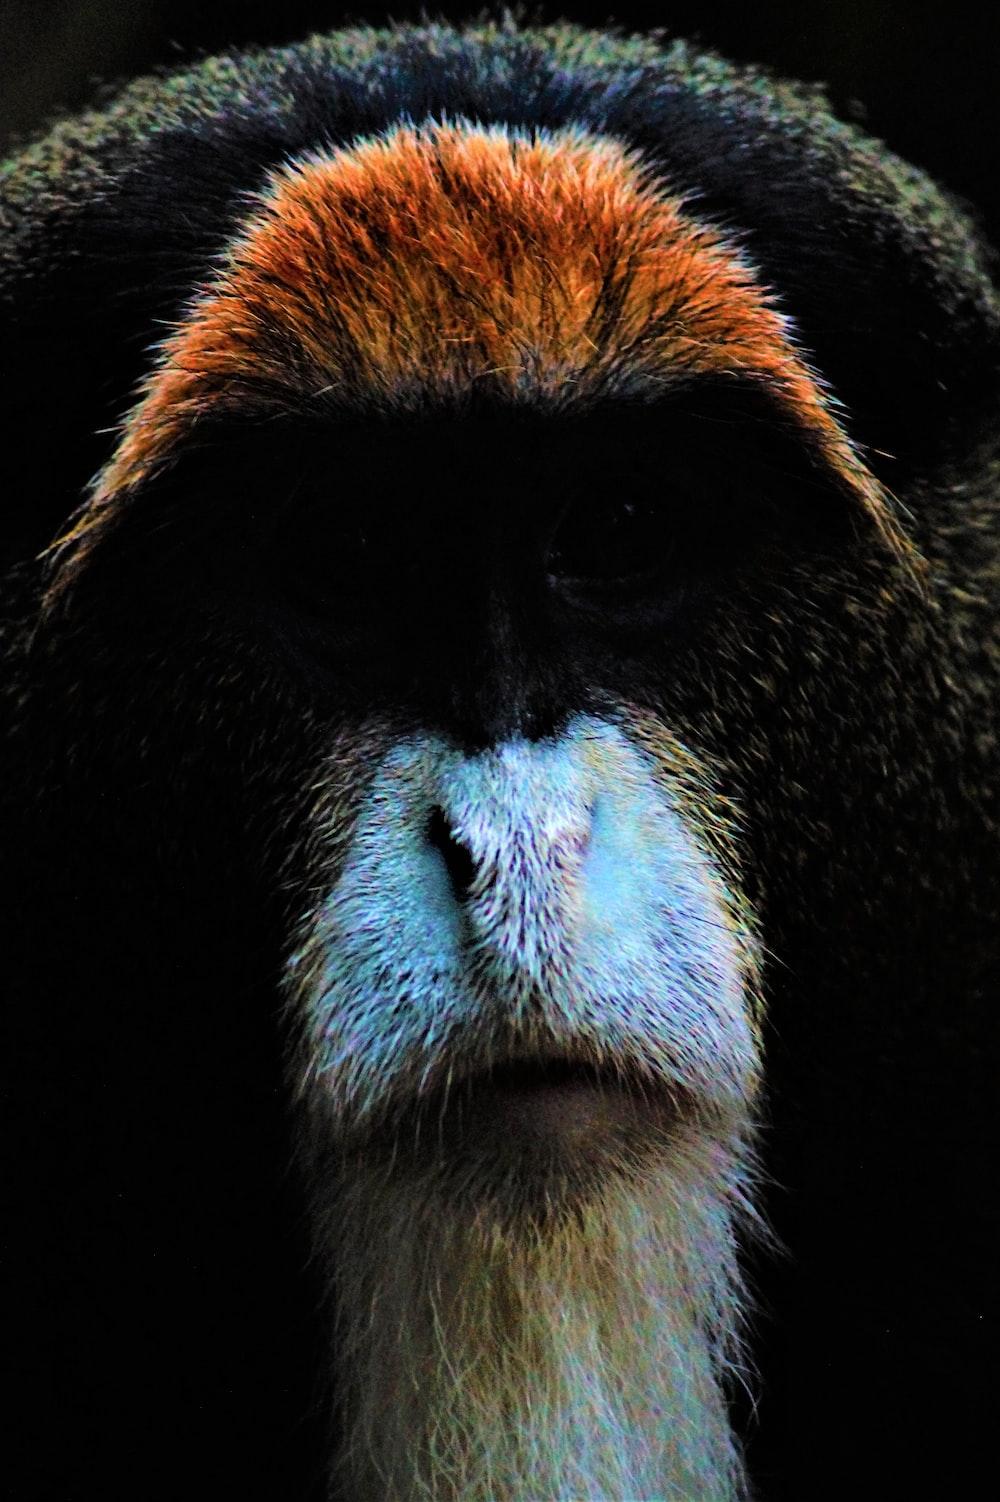 close photography of animal